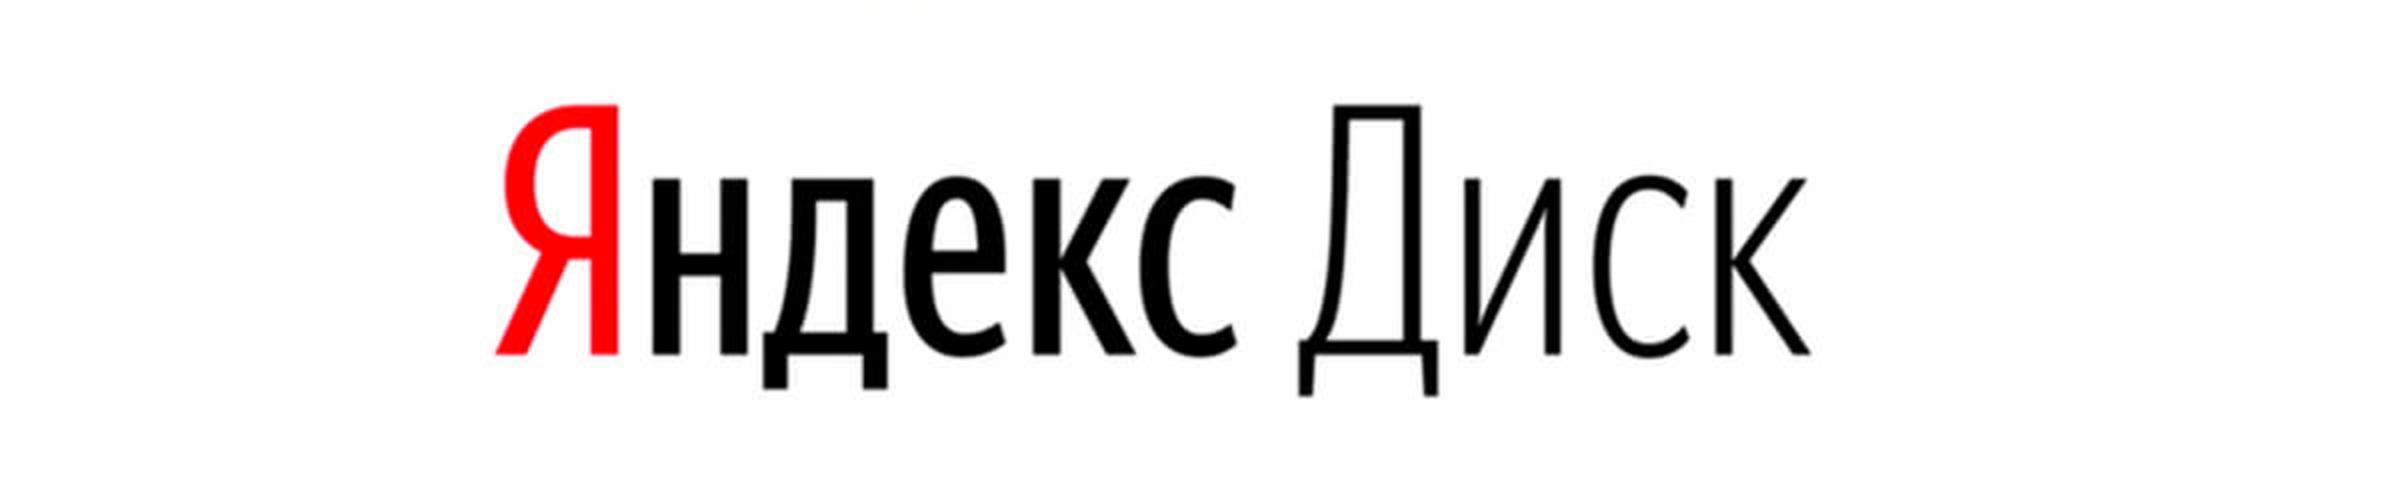 Как скачать фильм с Яндекс Диска на iPhone/iPad?